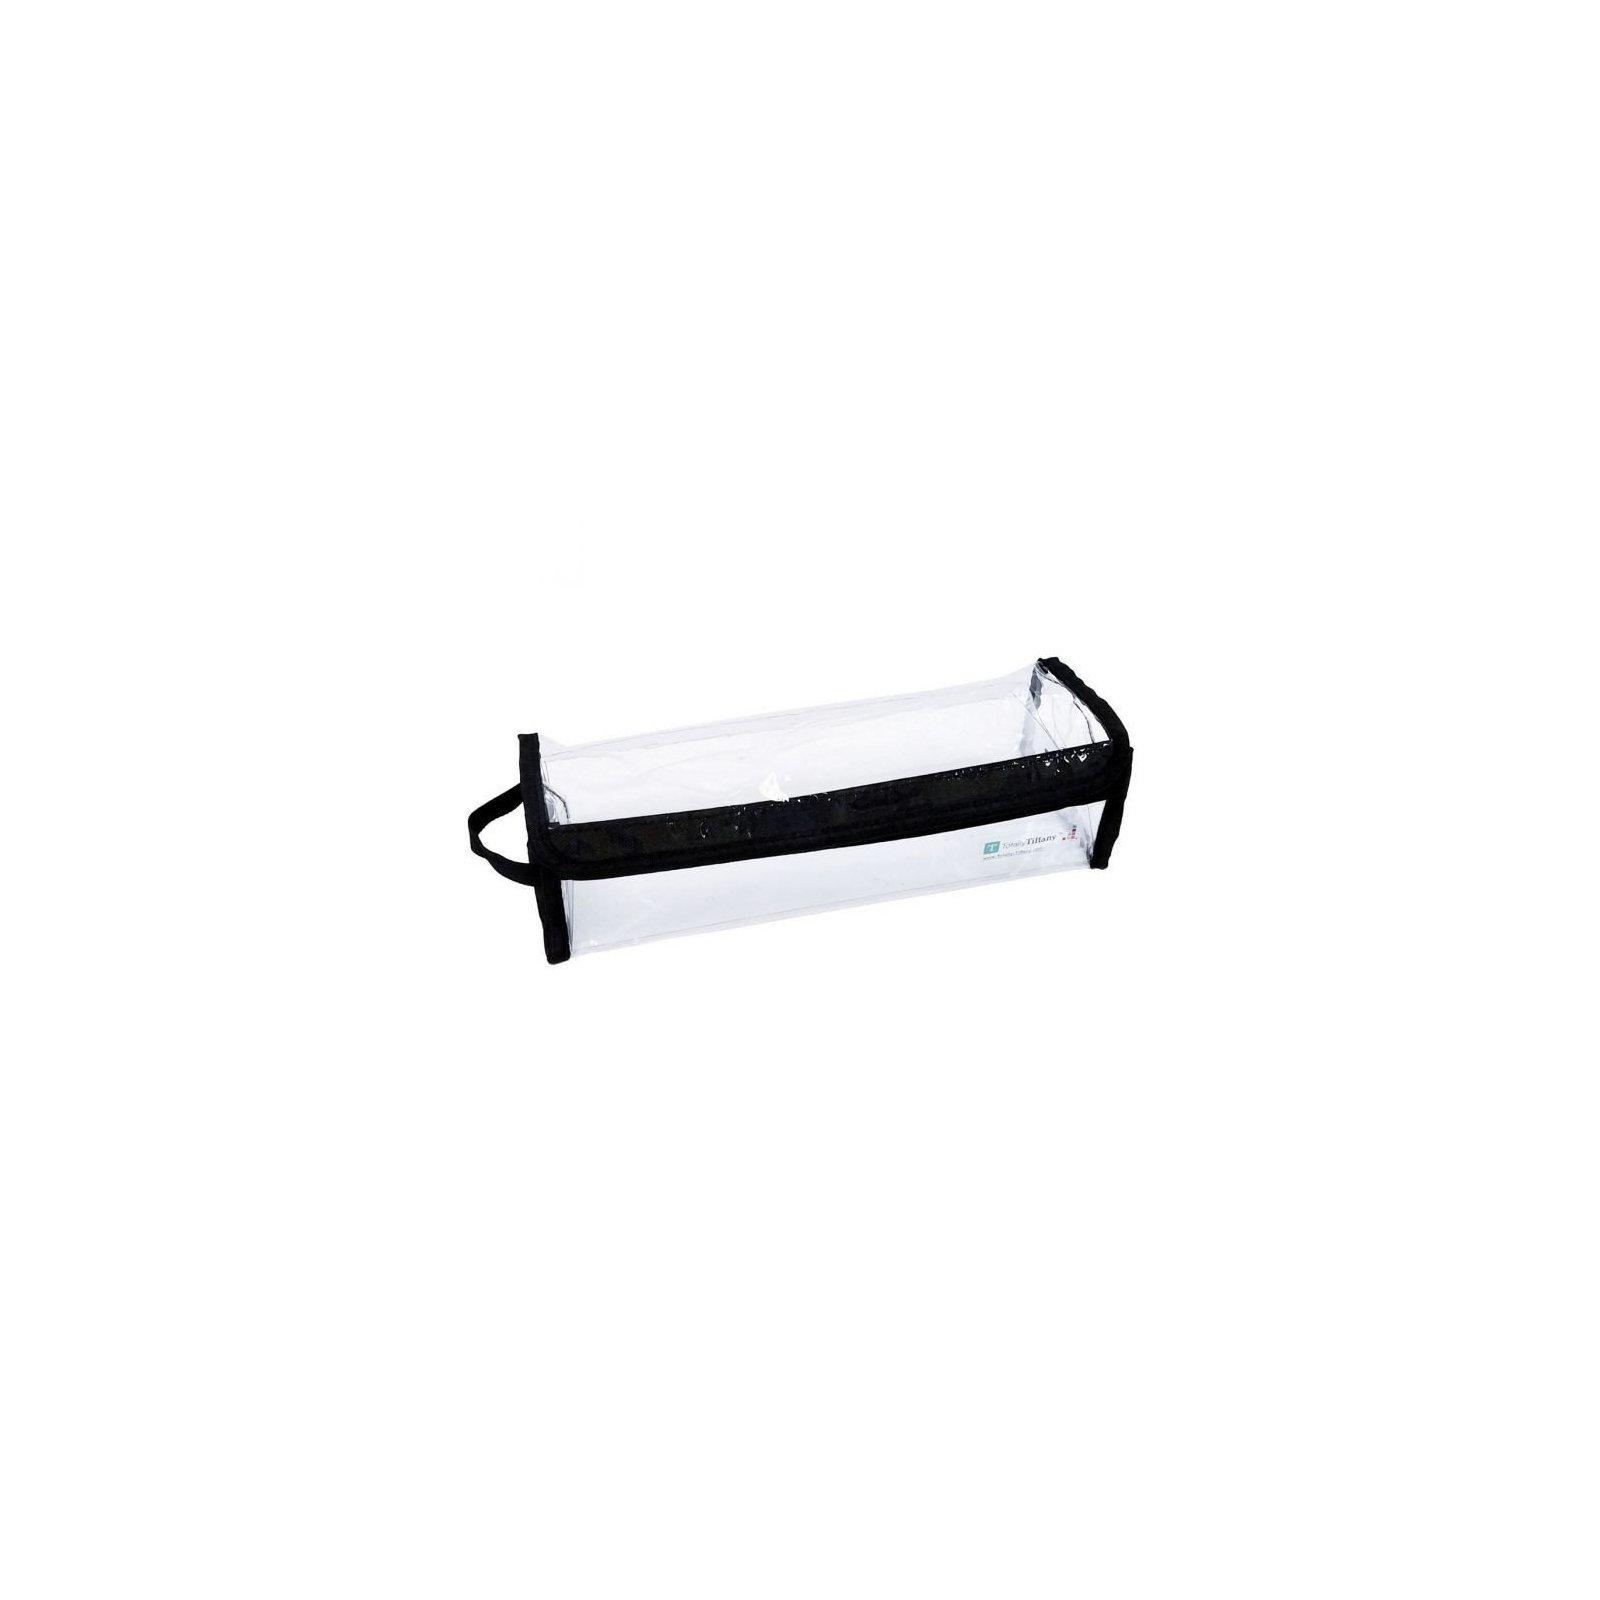 Petit sac de rangement - Edna Buddy Bag - EZ2Organize - Totally Tiffany